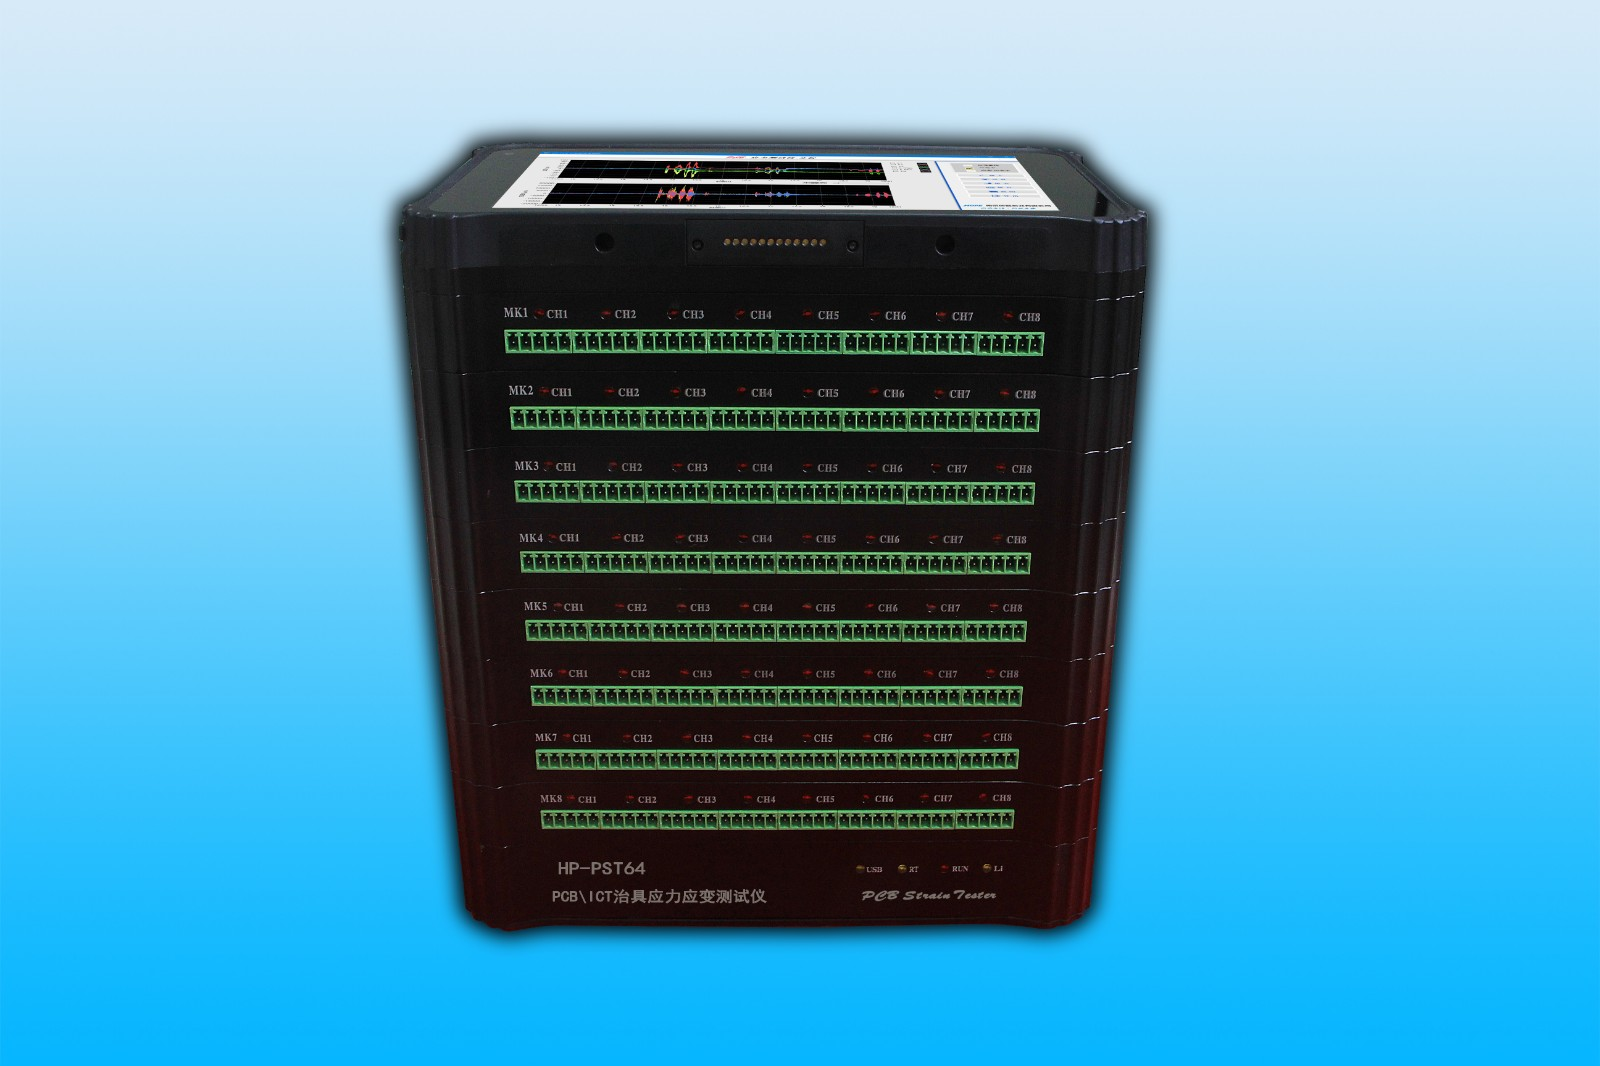 HP-PST64 印制板优发国际顶级在线应变测试仪